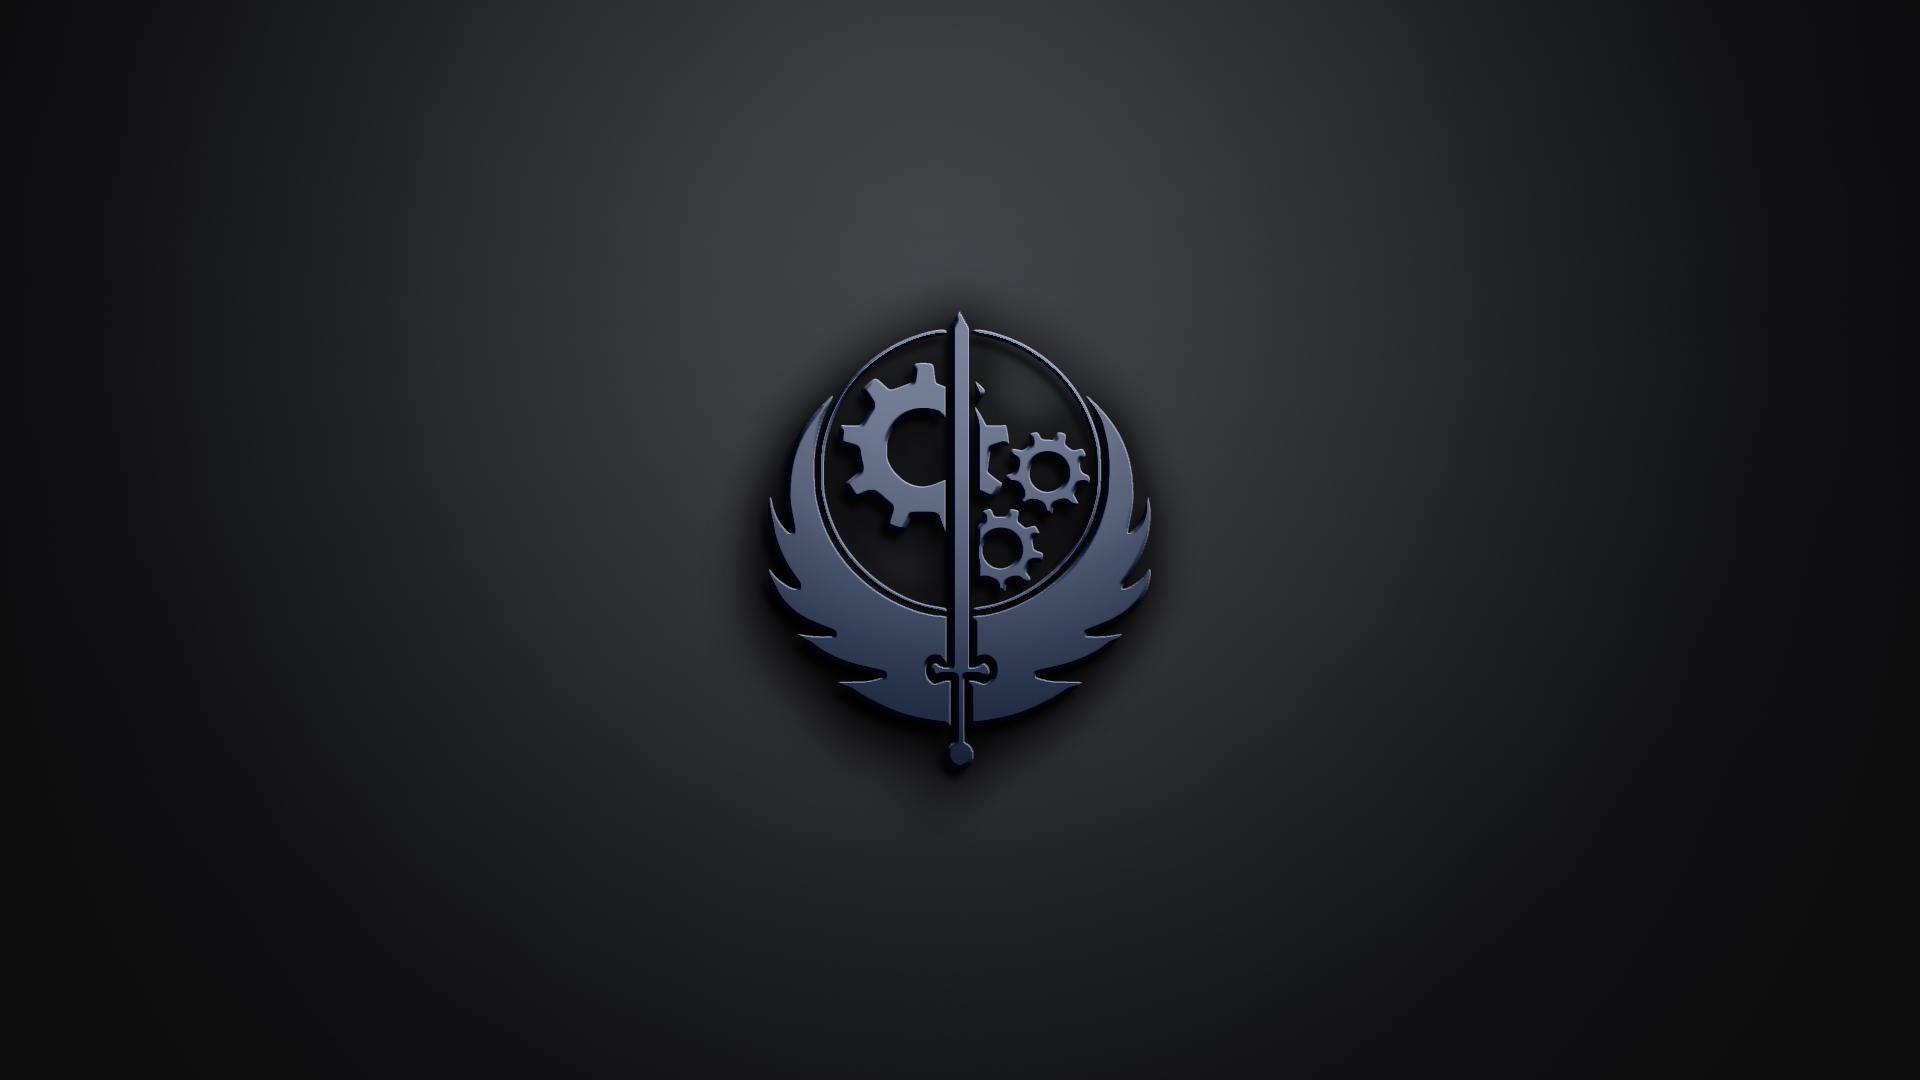 wallpaper.wiki-Backgrounds-Brotherhood-Of-Steel-HD-PIC-